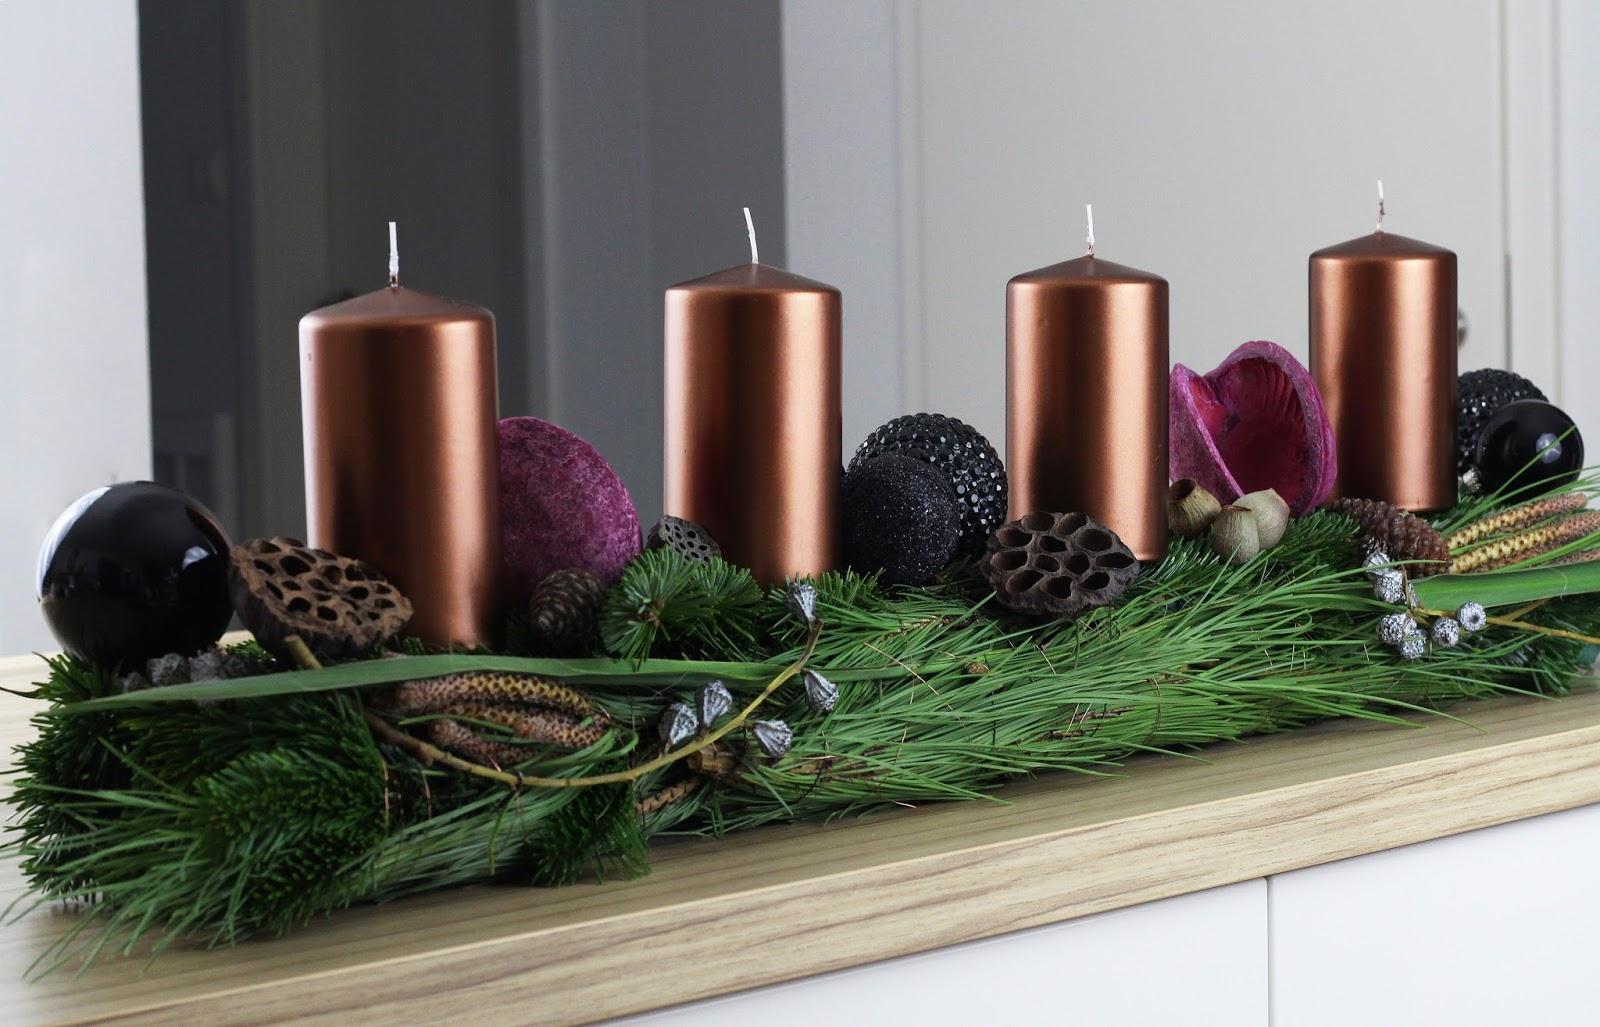 ideenanstoss das adventsgesteck diy. Black Bedroom Furniture Sets. Home Design Ideas